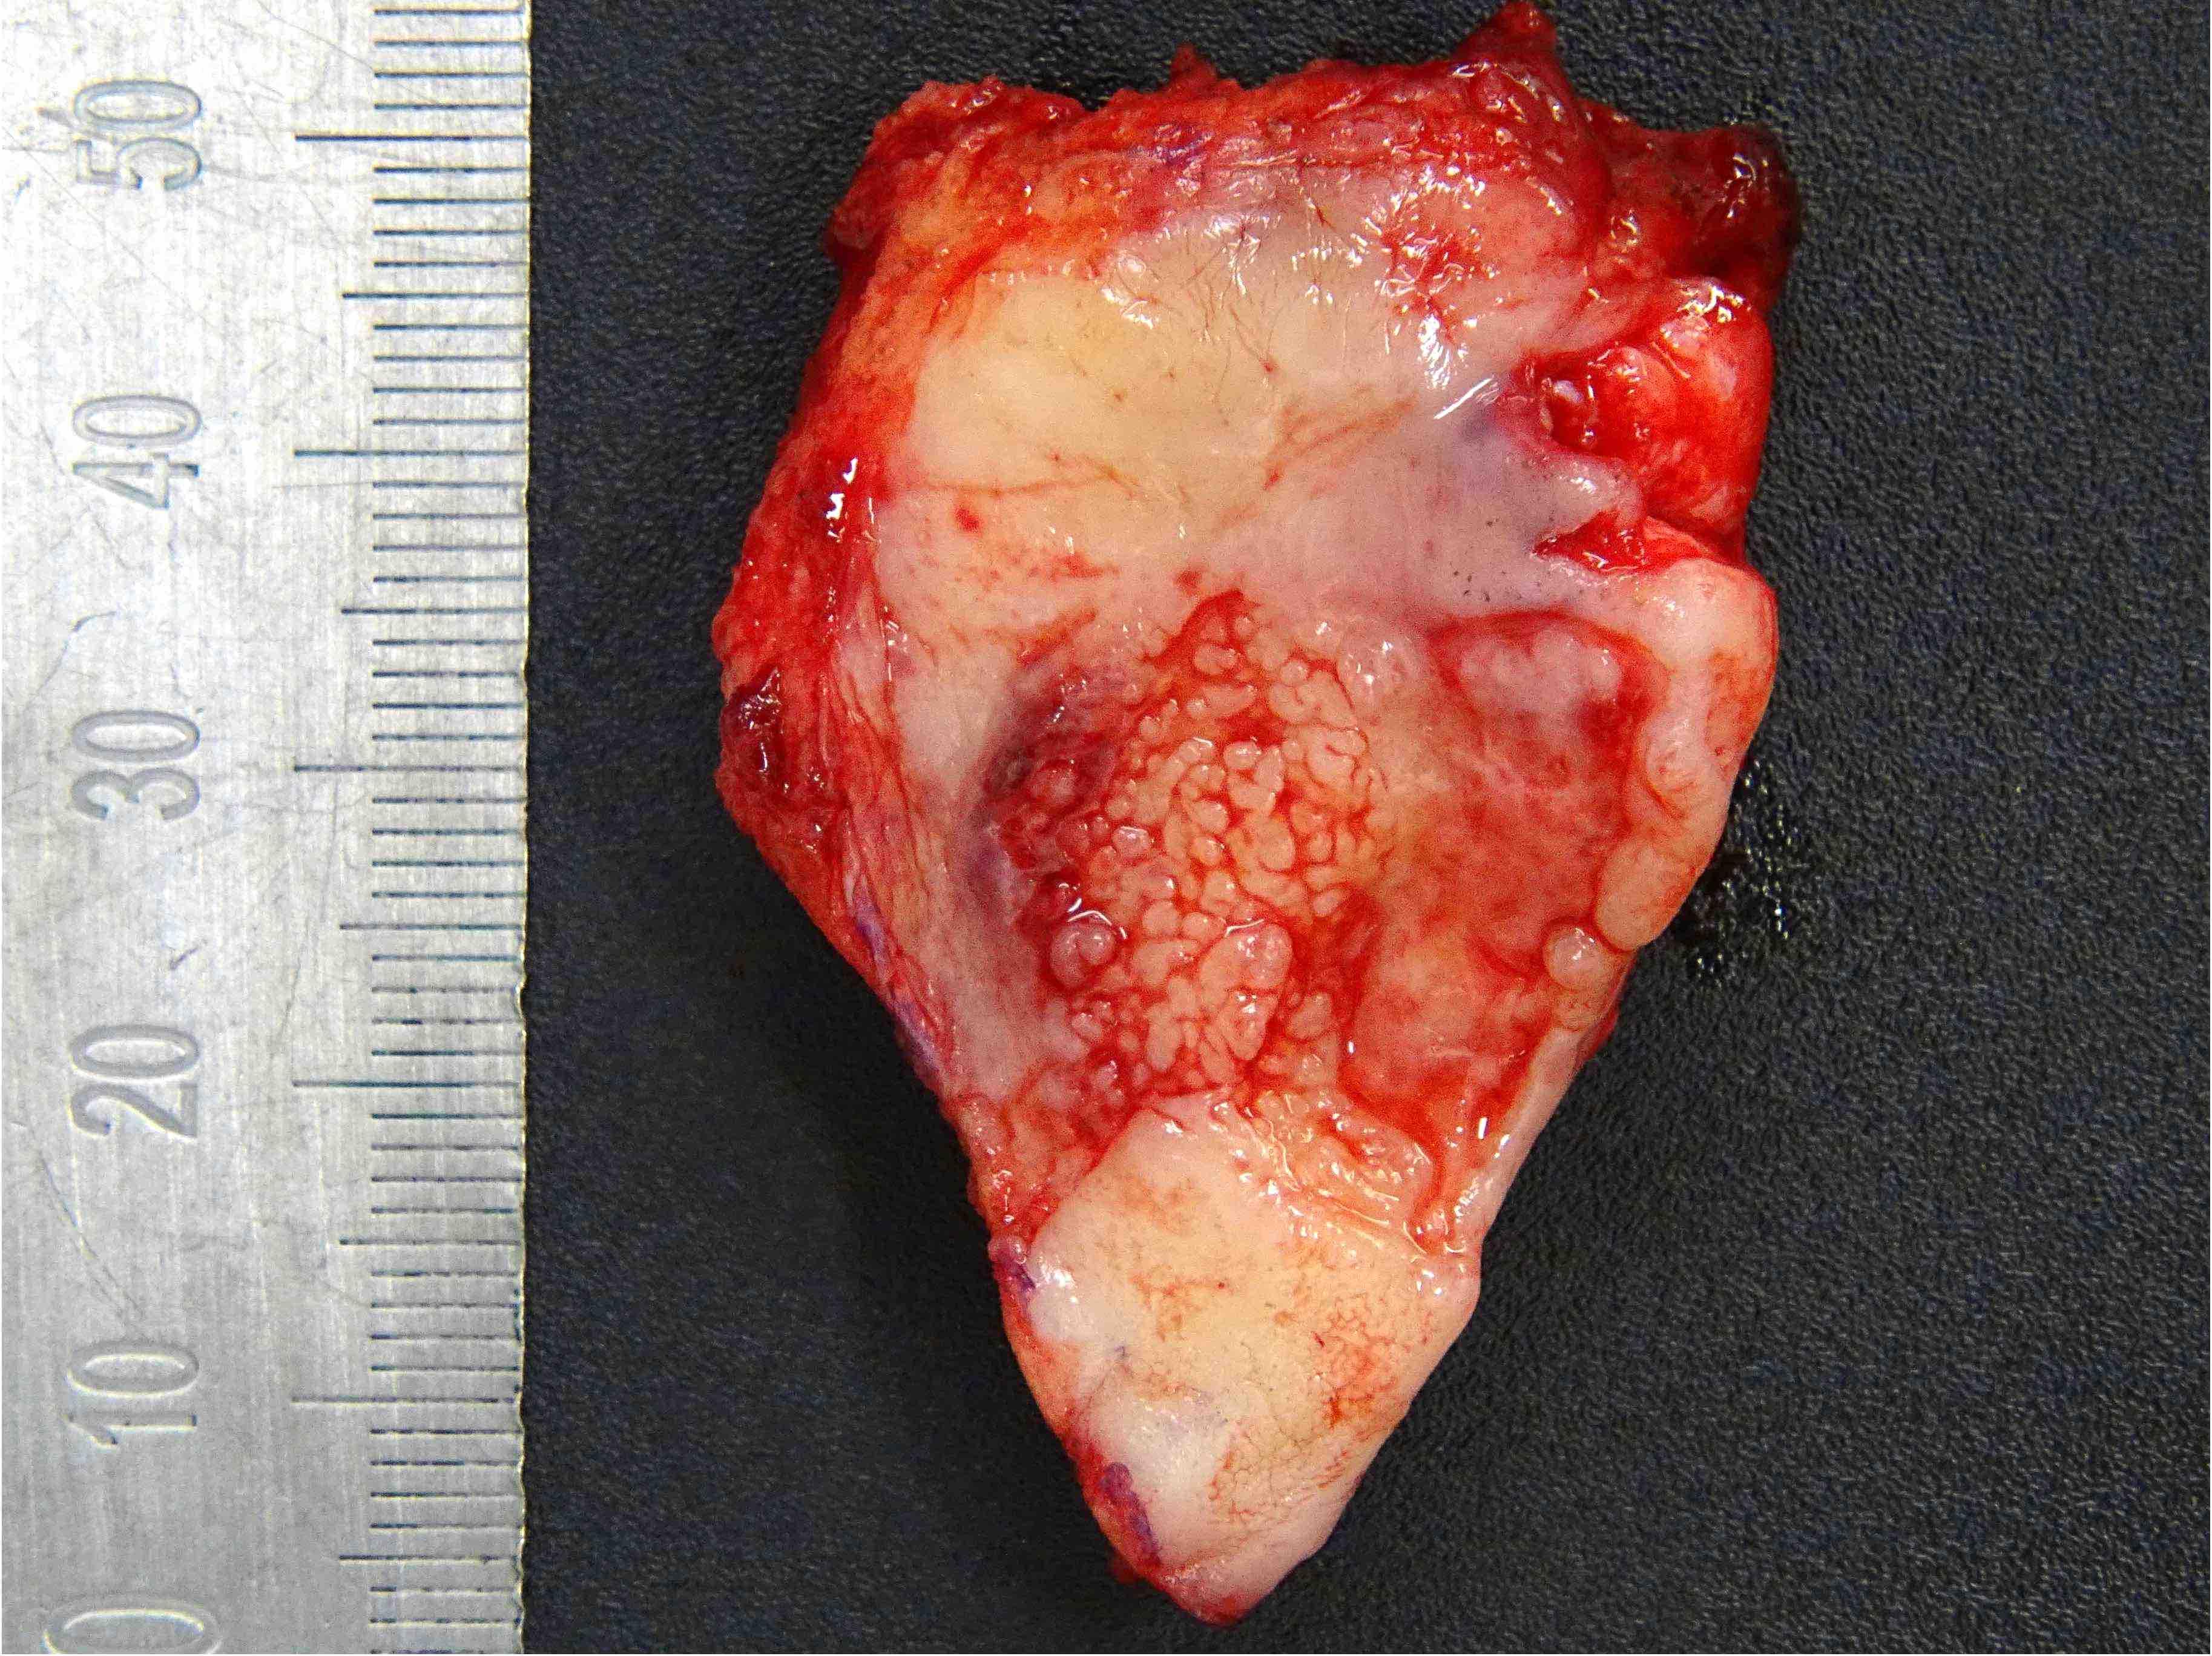 Verrucous mucosal lesion